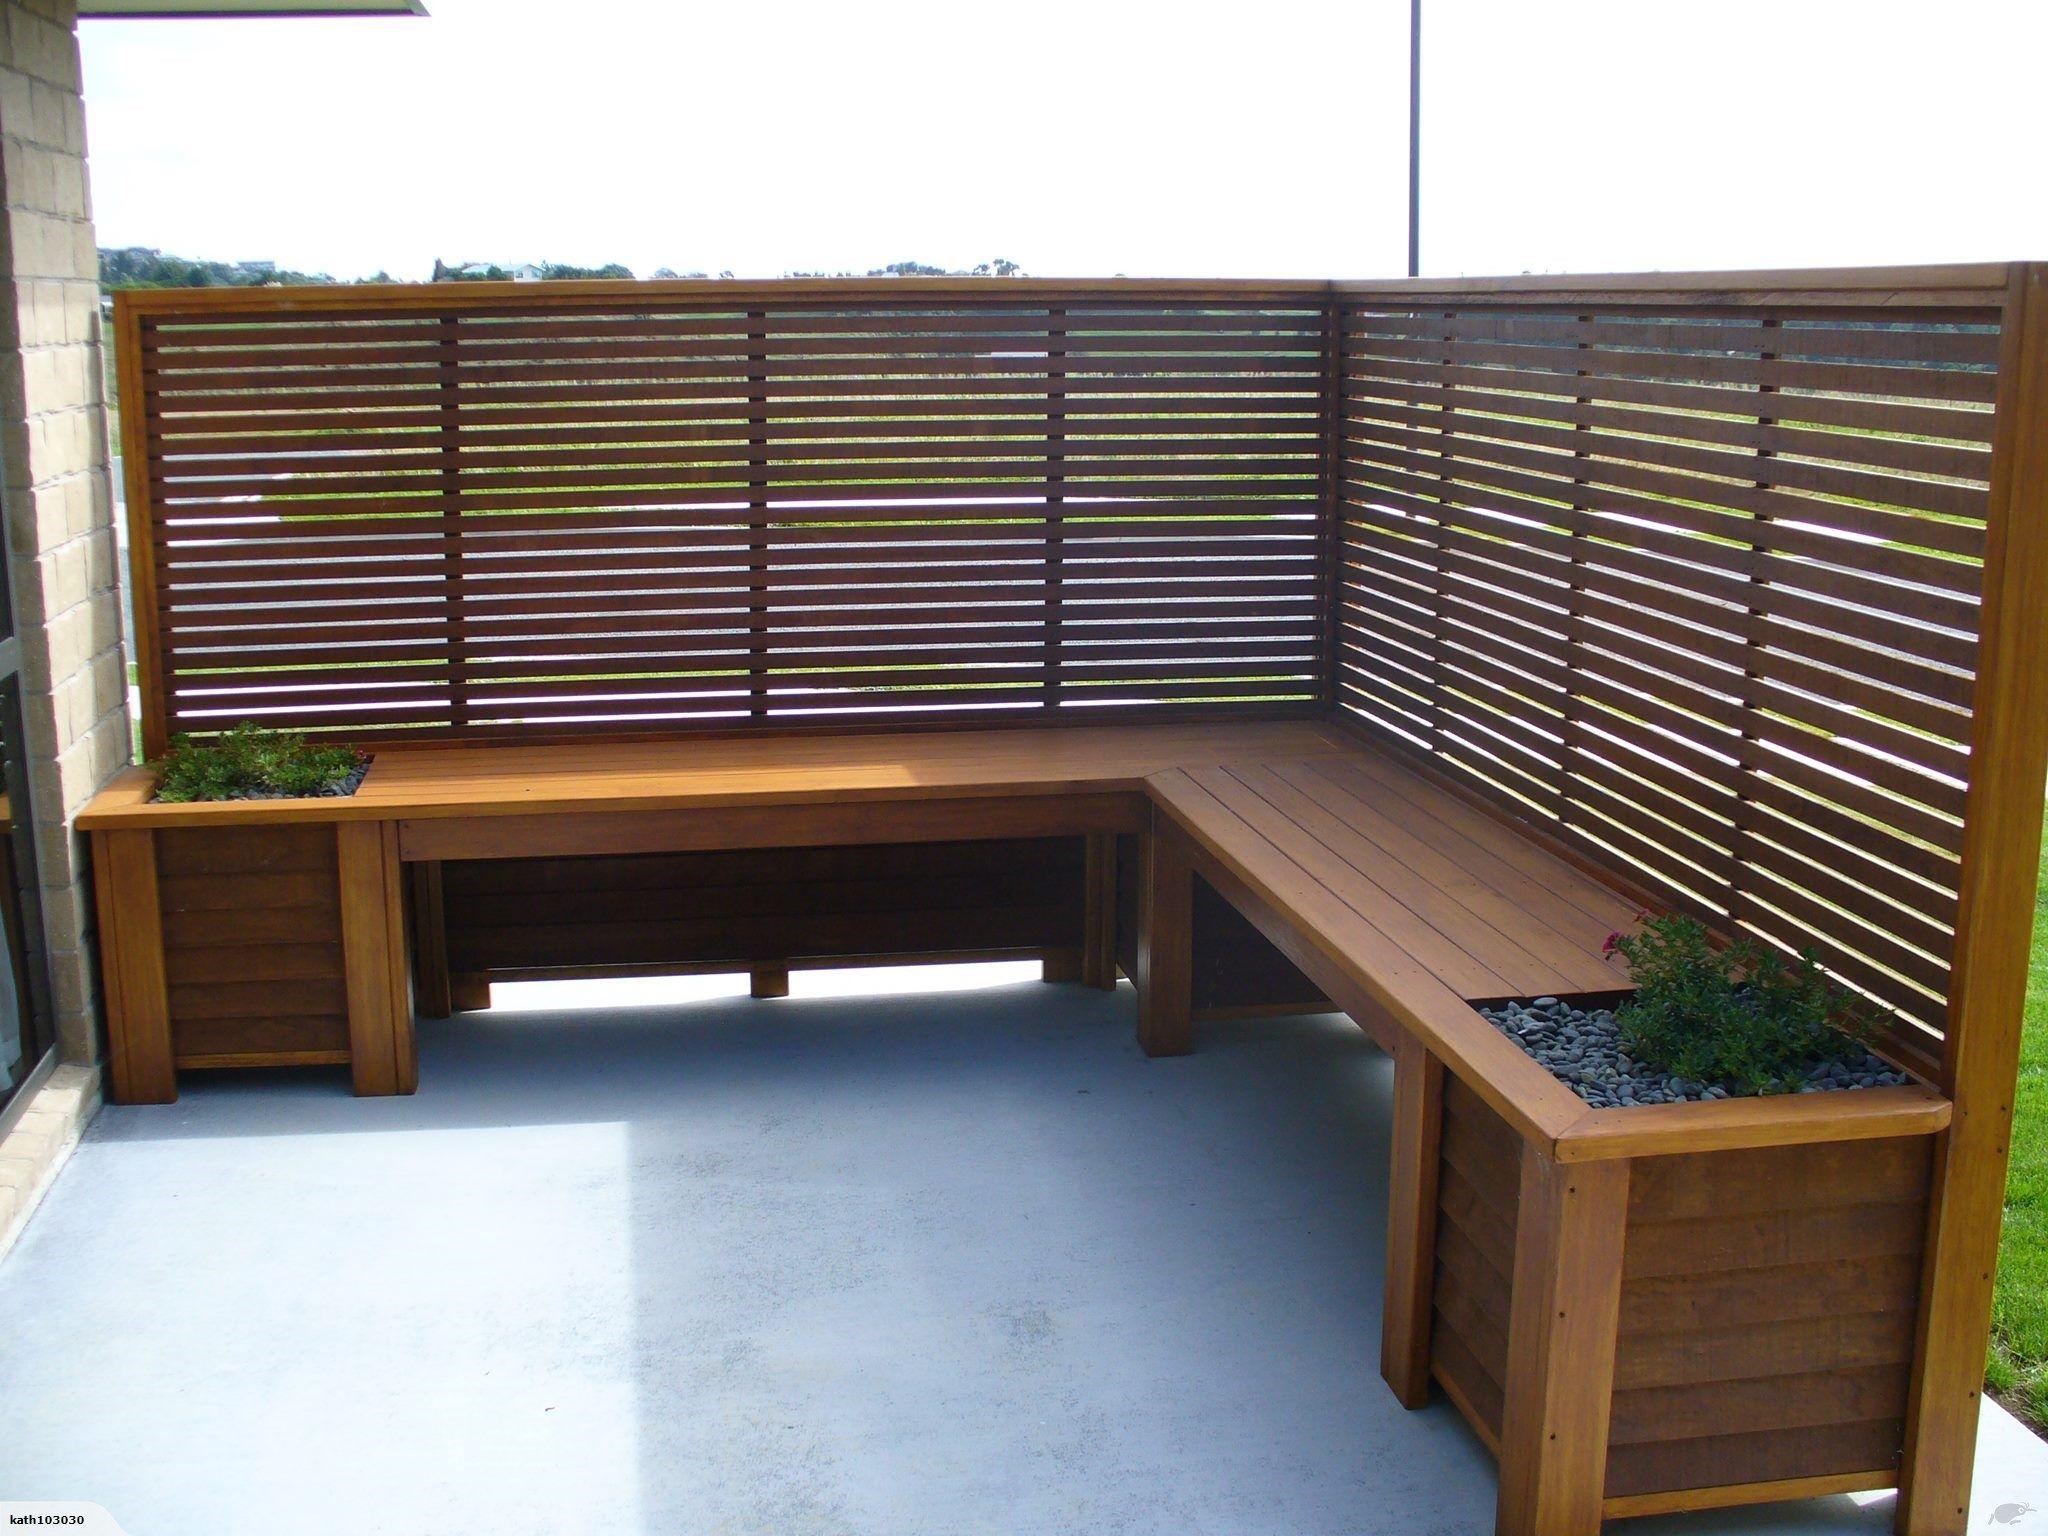 Corner Outdoor Bench Planters With Trellis Screen Trade Me Backyard Patio Designs Outdoor Bench Planter Trellis